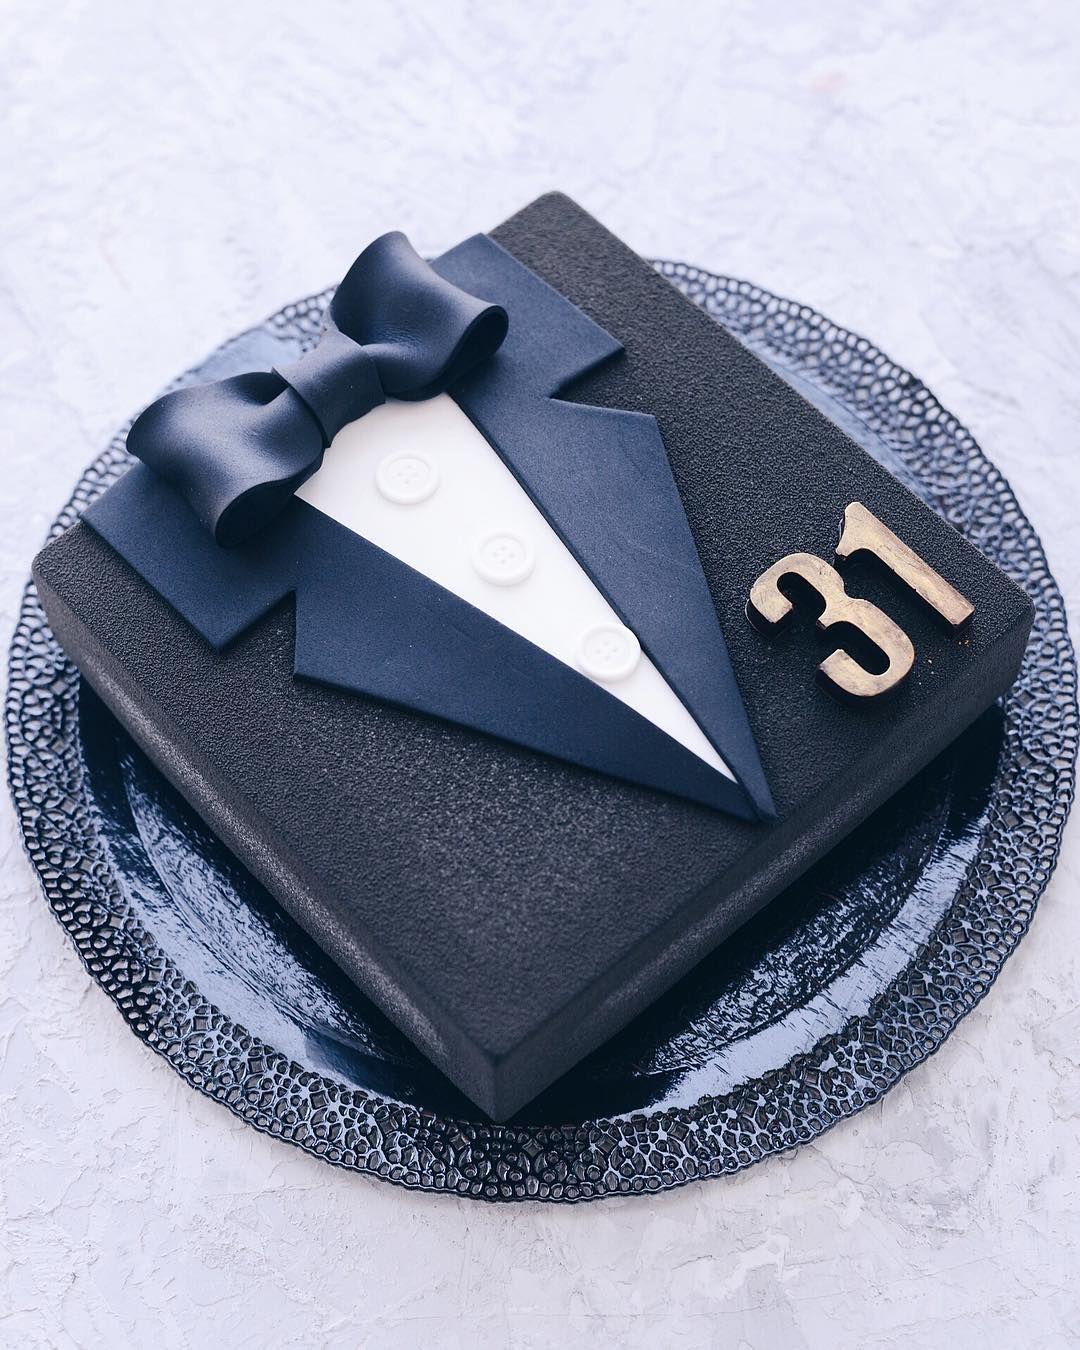 Net Opisaniya Foto Great For Husband Birthday Cake For Husband Birthday Cake For Husband Cake Design For Men